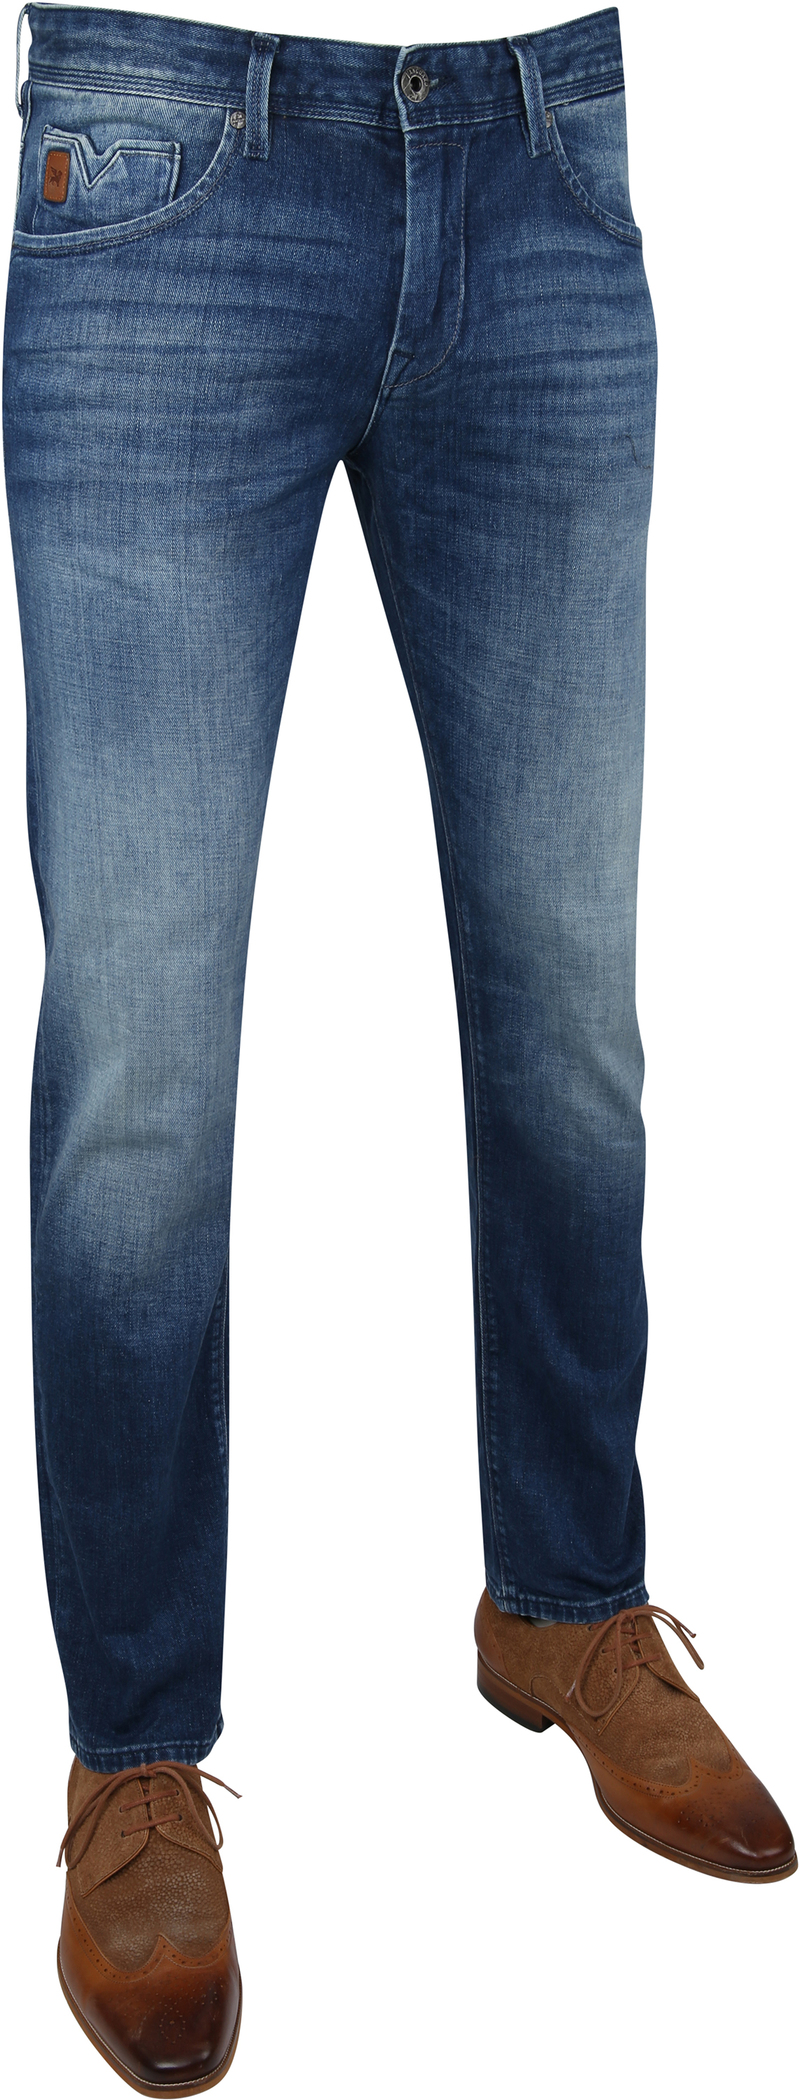 Vanguard V7 Rider Jeans Grey Beige photo 5